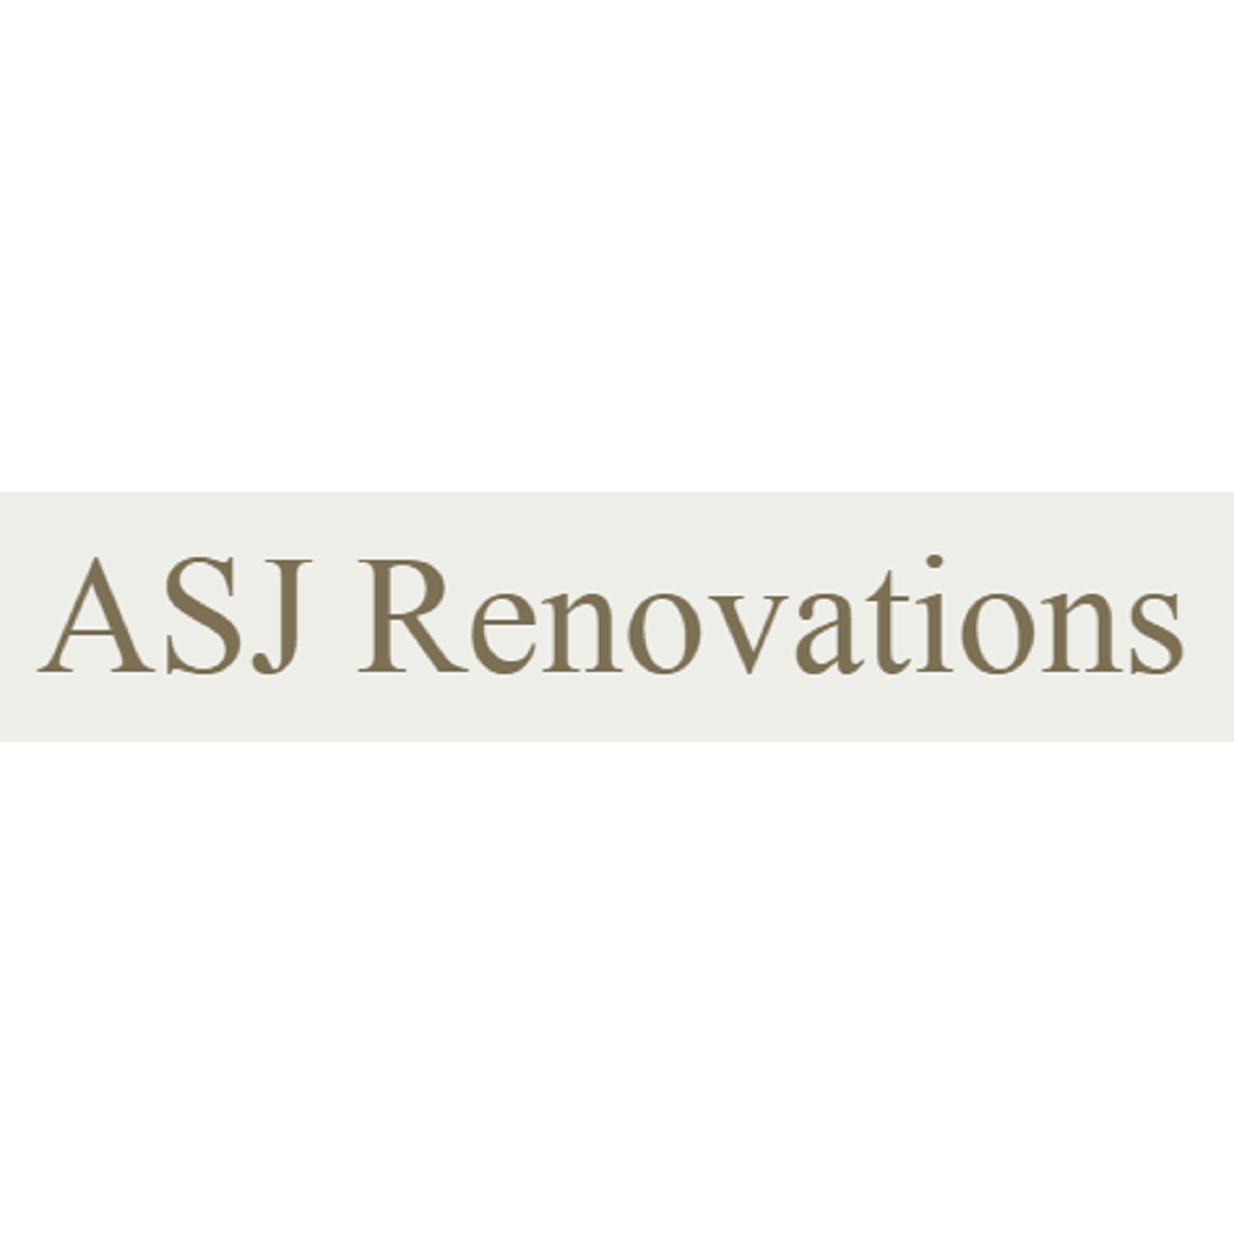 ASJ Renovations, LLC